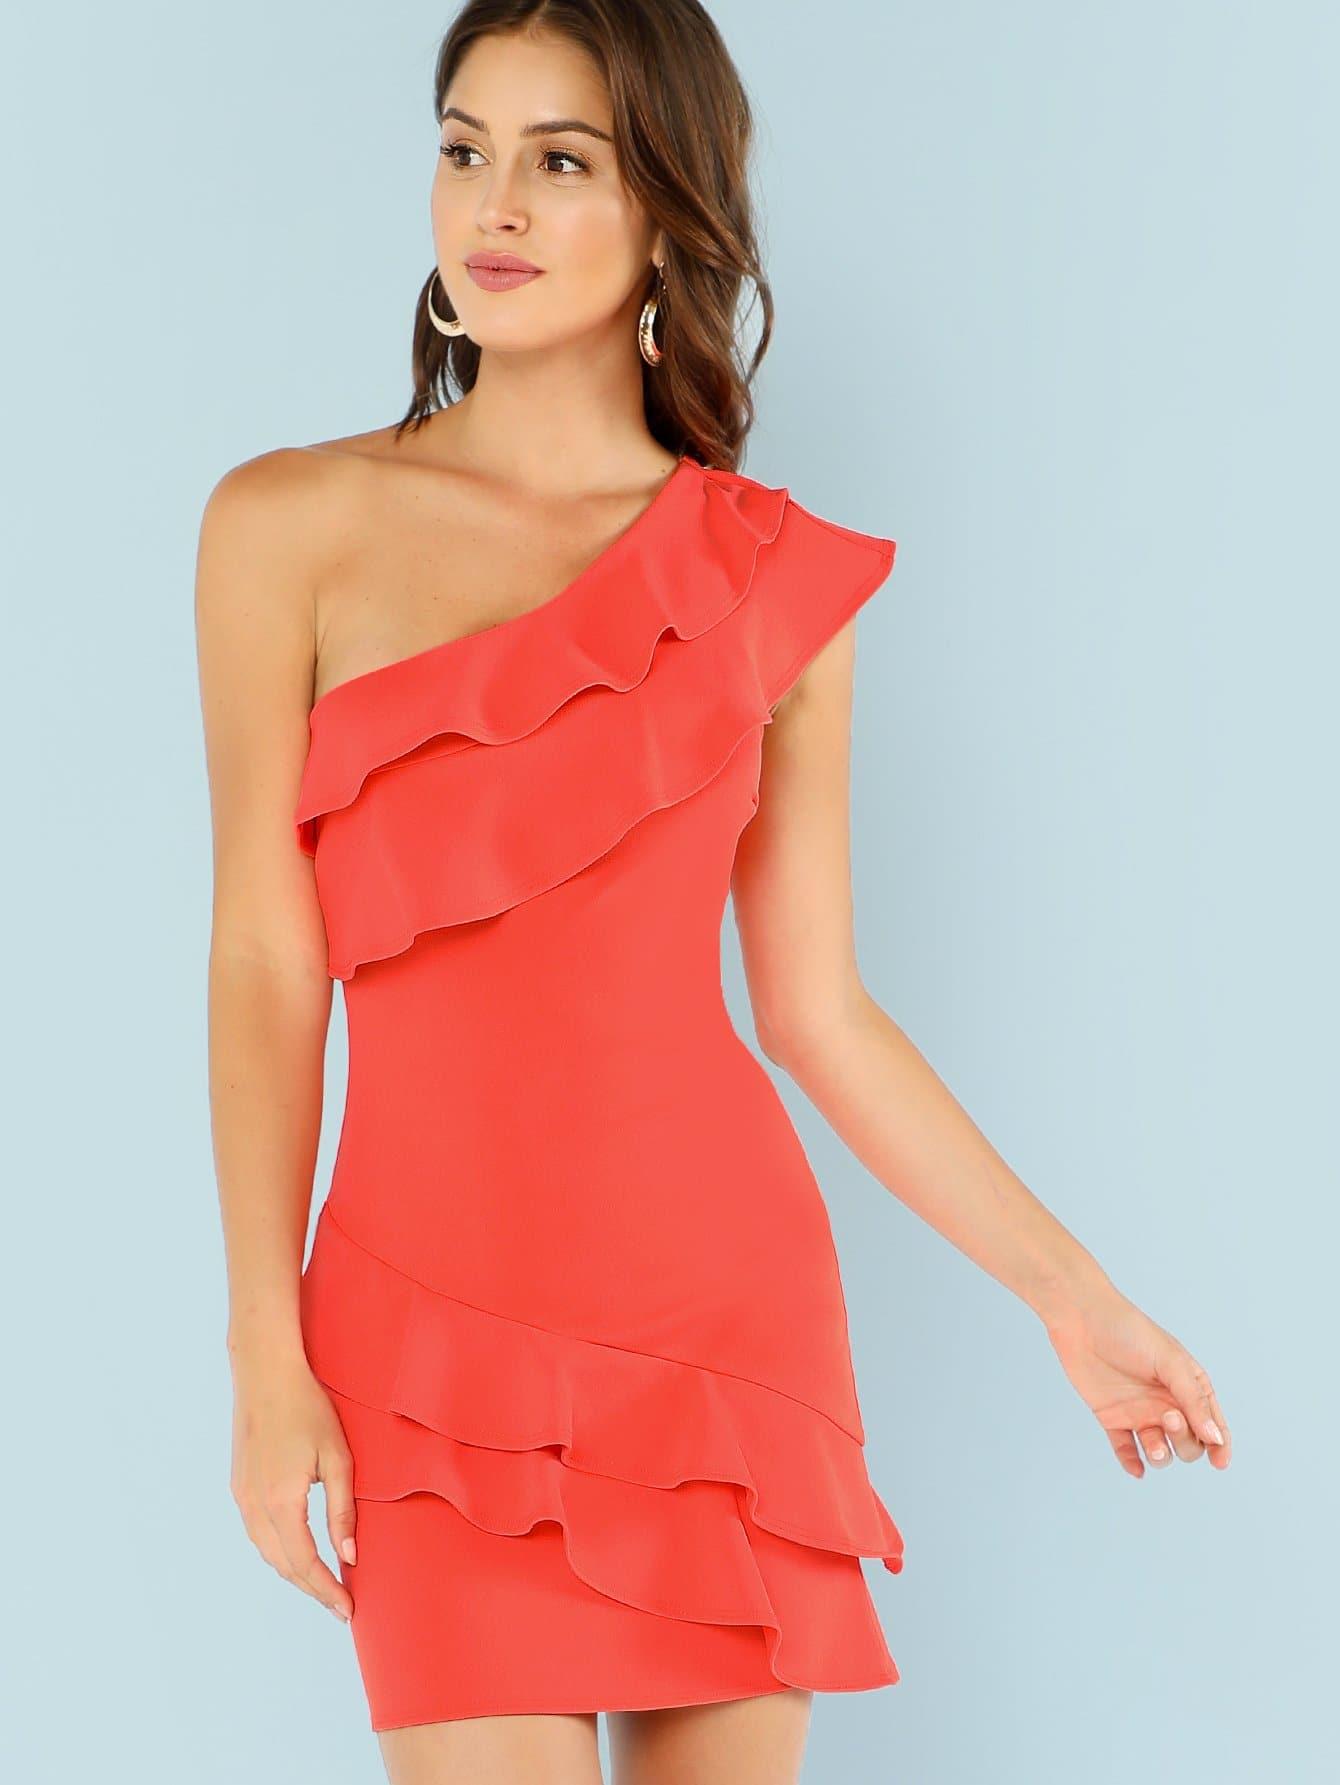 fba04c0bd40 Women's Clothing Off The Shoulder High Low Dip Hem Bardot Summer Party Dress  Plus Size 14-18